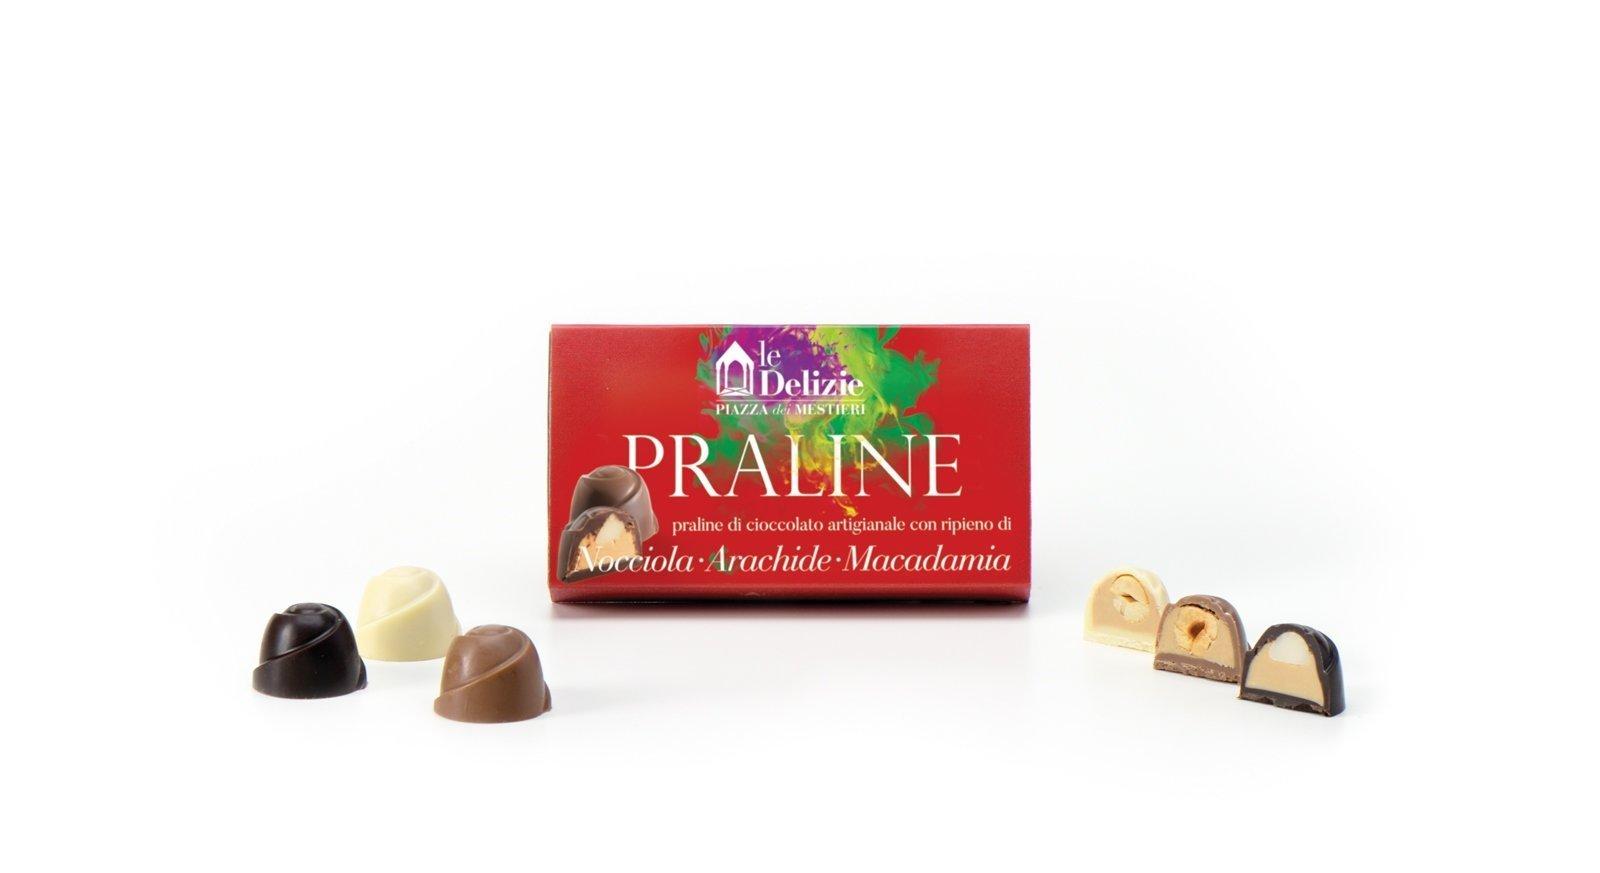 chocolate chotolates praline hazelnut peanut macadamia